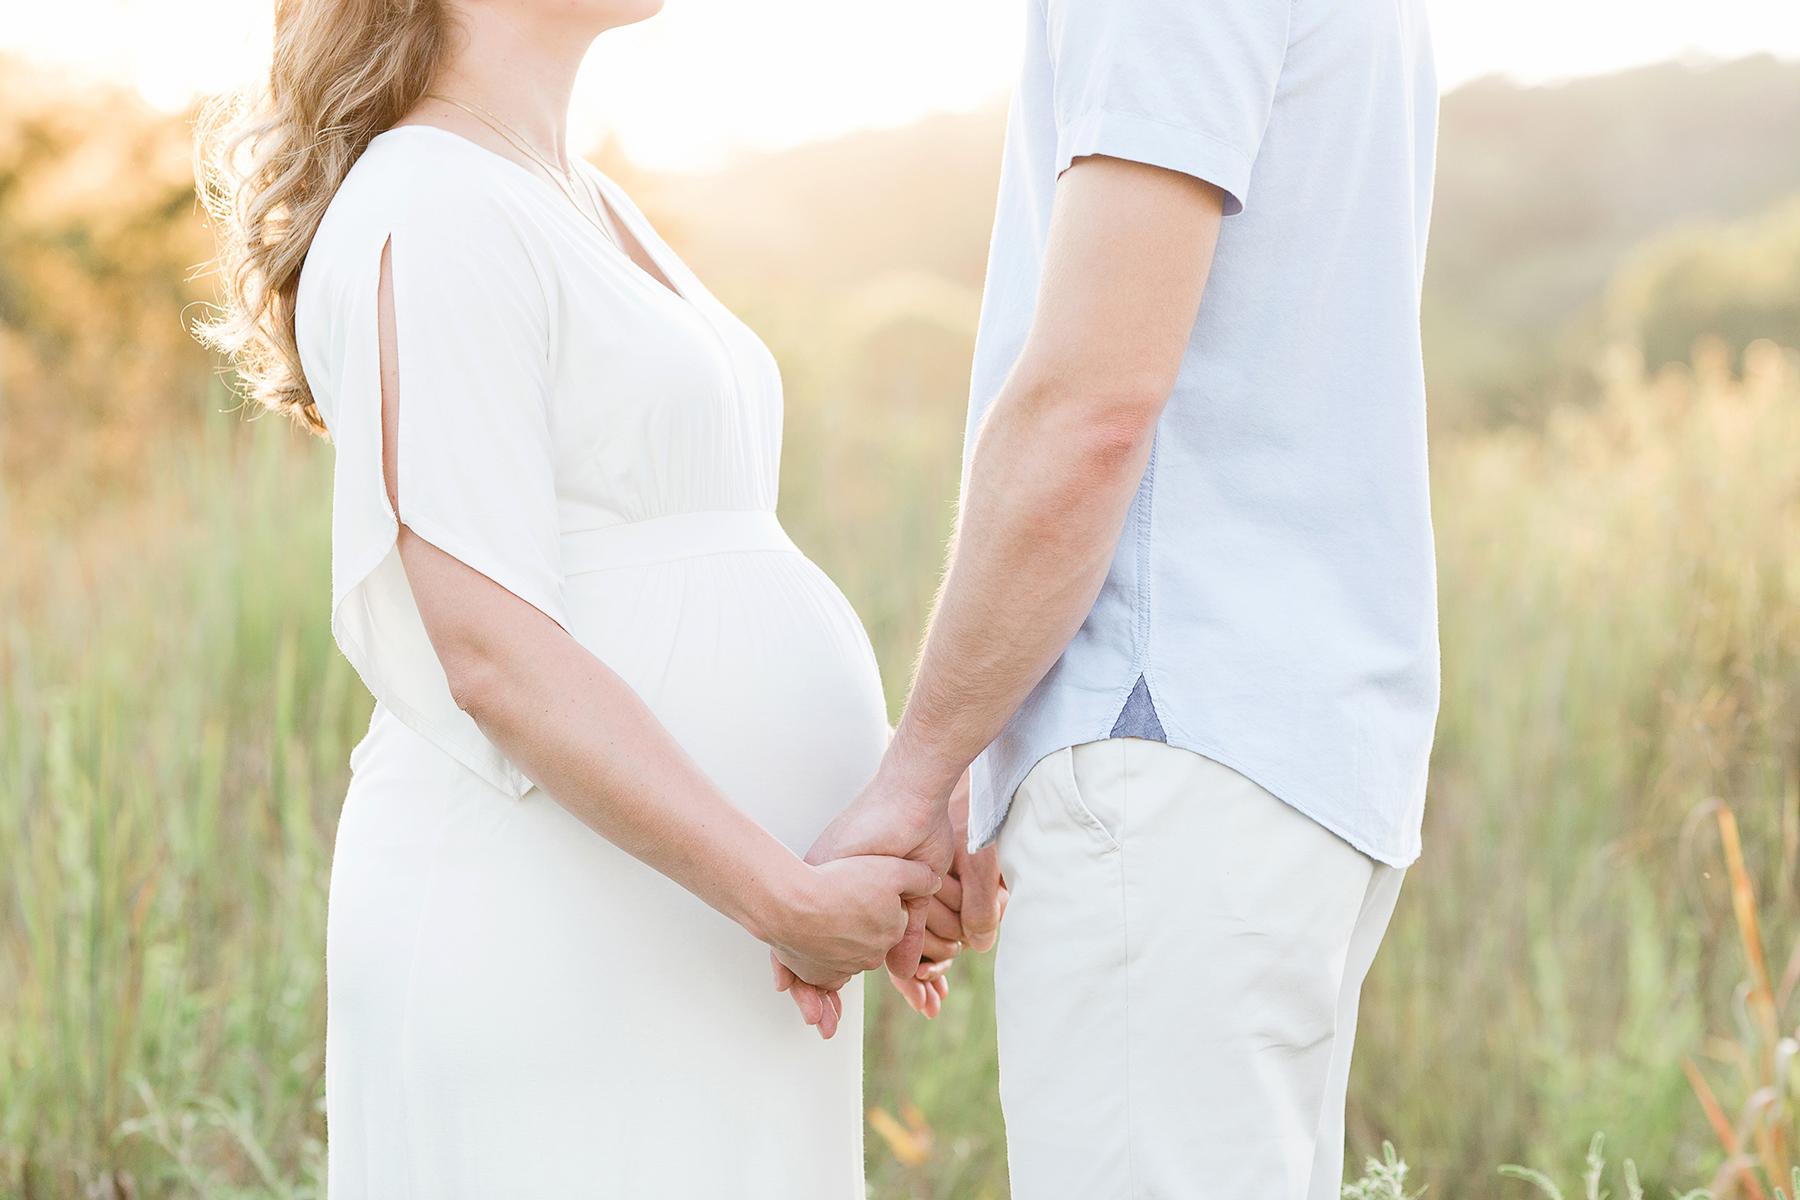 Louisville Ky Maternity Photographer | Julie Brock Photography | Newborn Photorapher | outdoor maternity photo session in a field.jpg